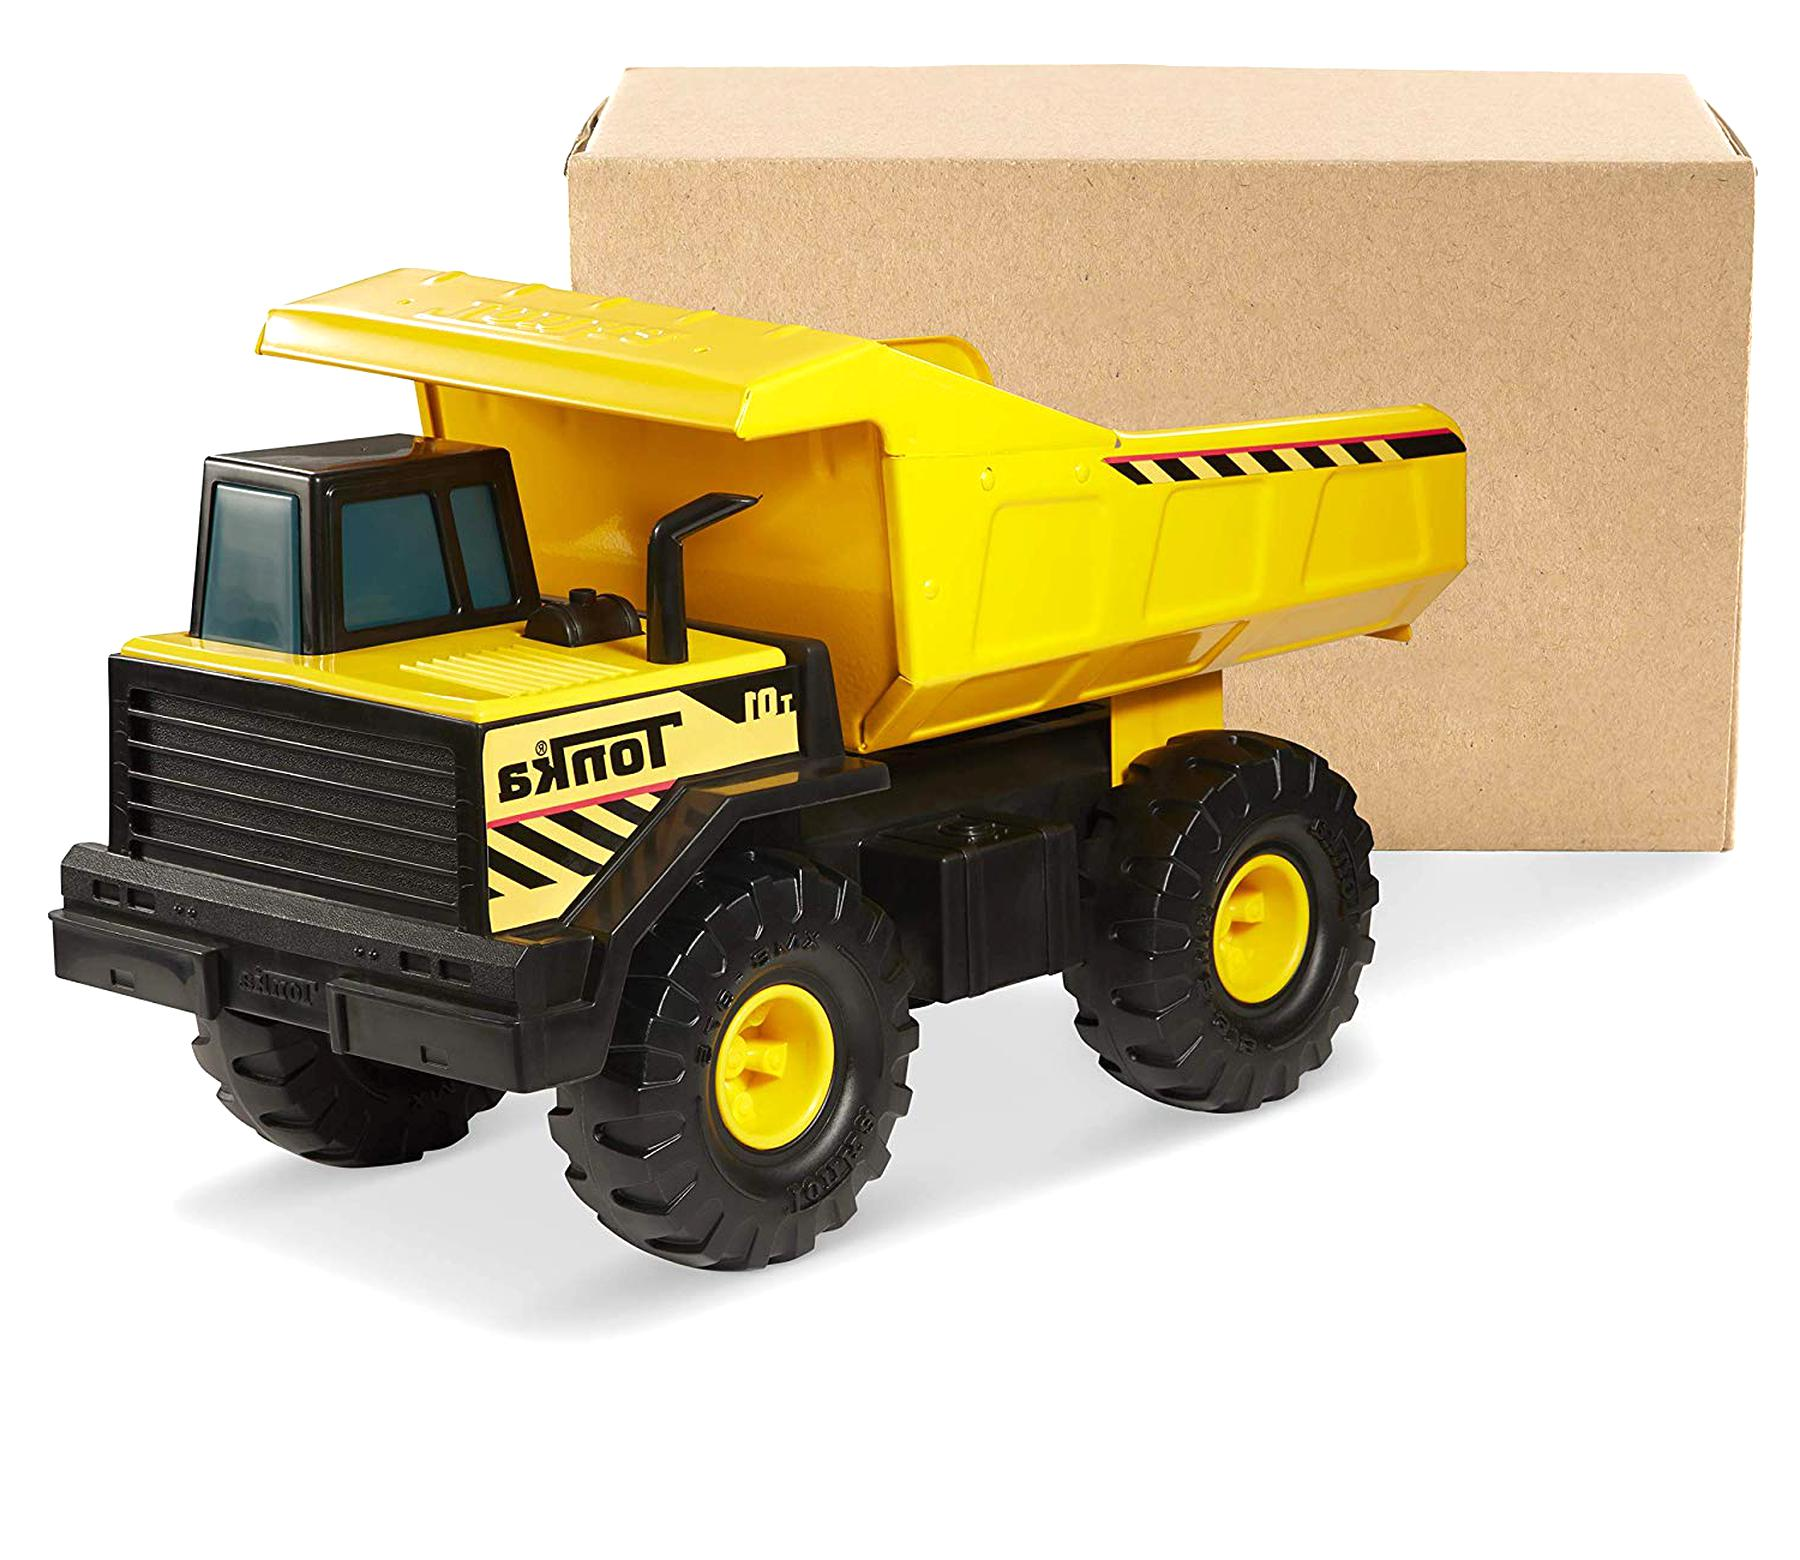 Tonka Toy Trucks >> Tonka Toy Truck For Sale In Uk 69 Used Tonka Toy Trucks